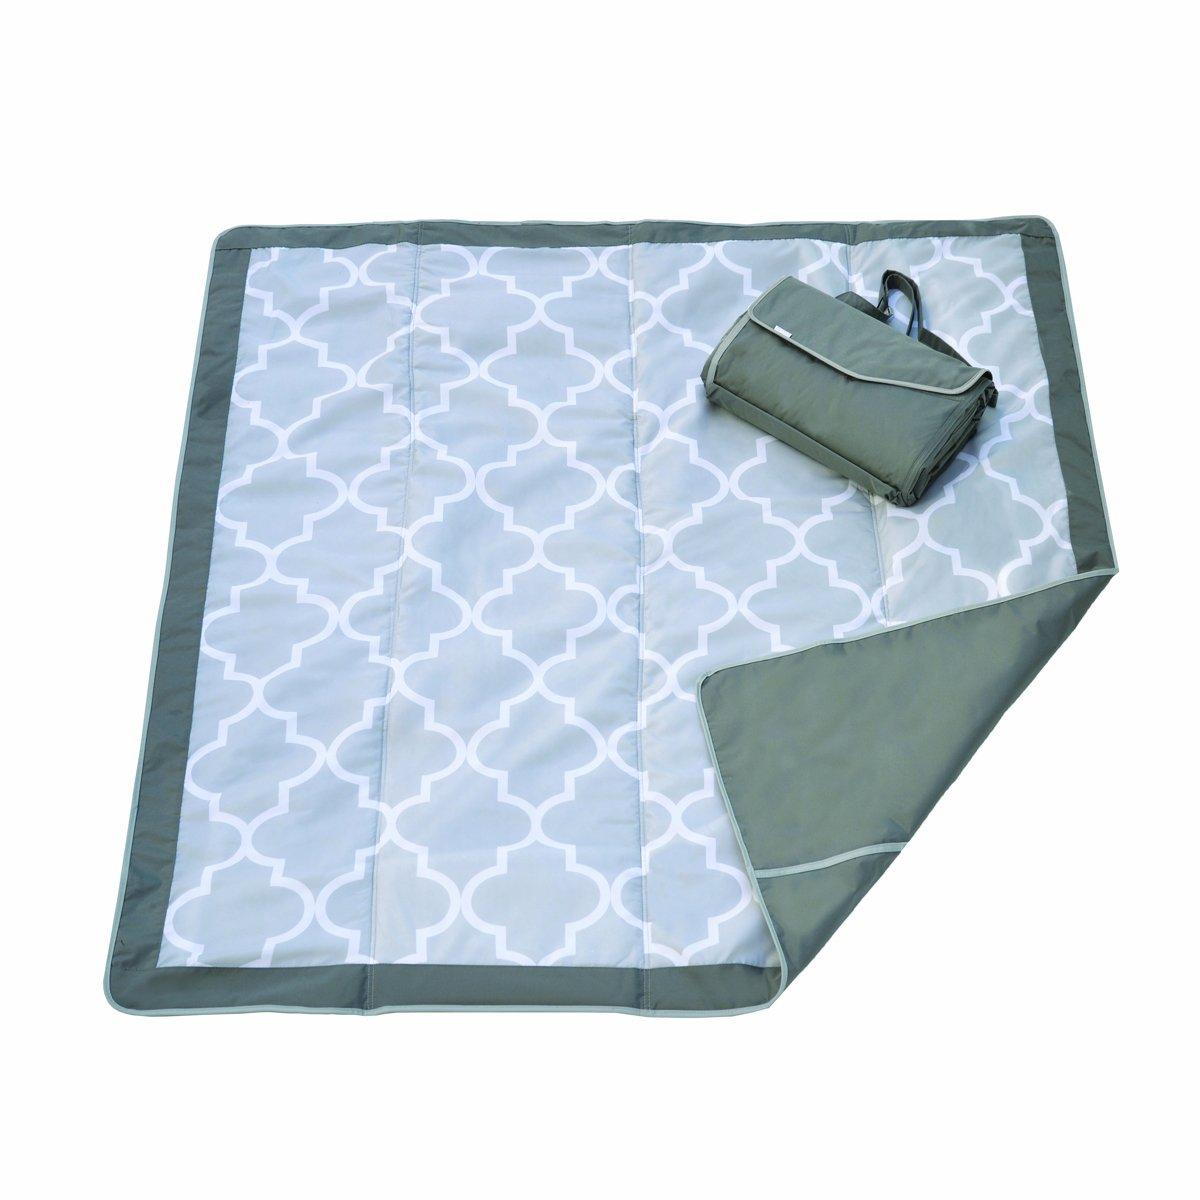 Jj Cole Outdoor Blanket, 5'X'5 Stone Arbor